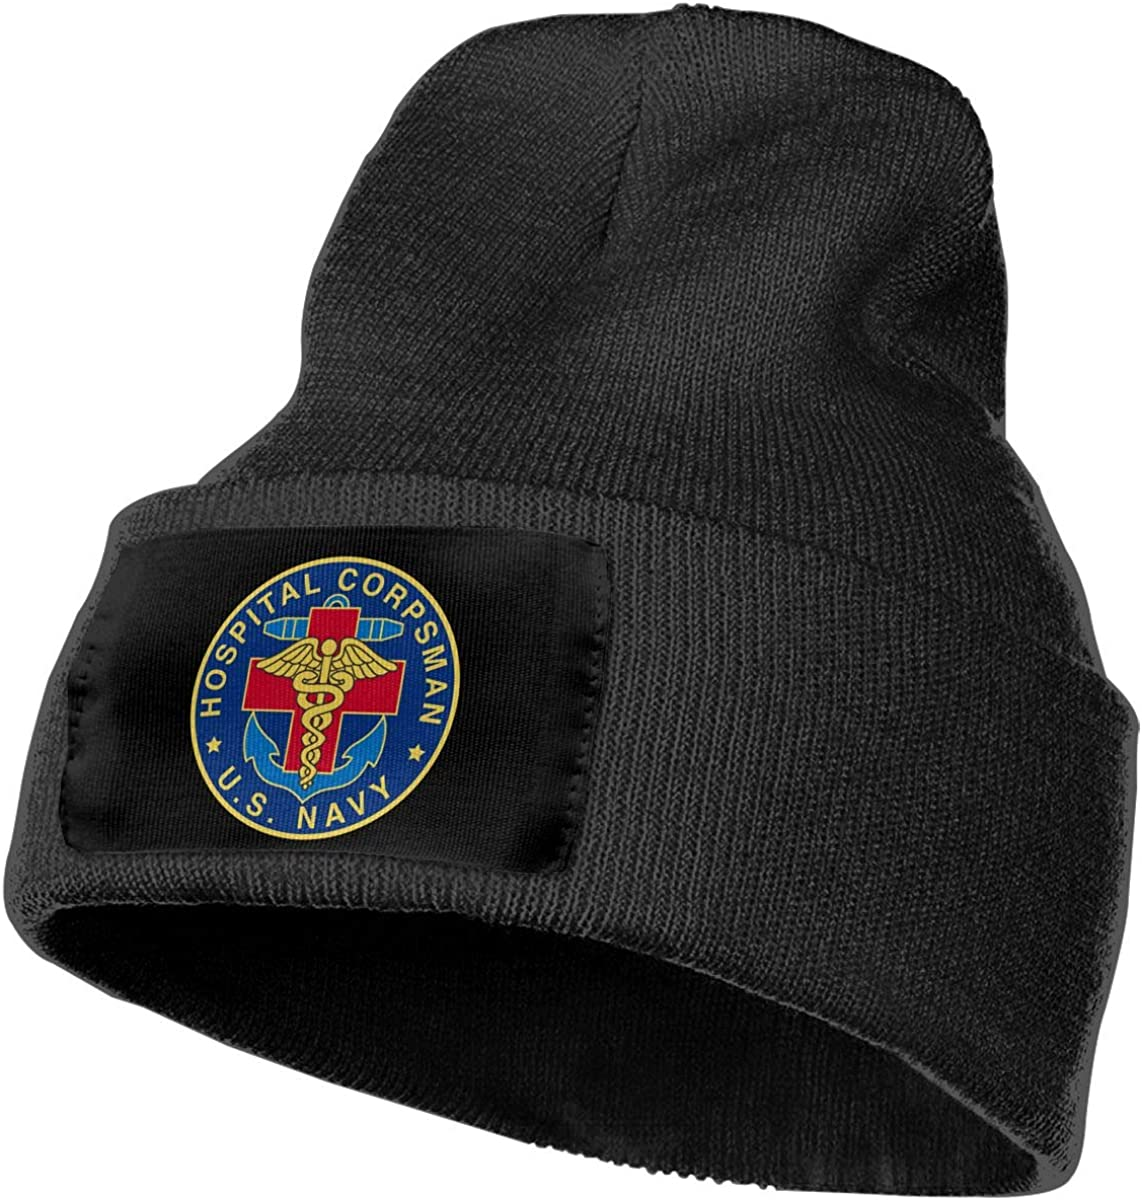 Feeke Mens/&Womens US Navy Hospital Corpsman Beanie Cap Thick,Soft,Warm Slouchy Knit Hat Winter Soft Ski Cap